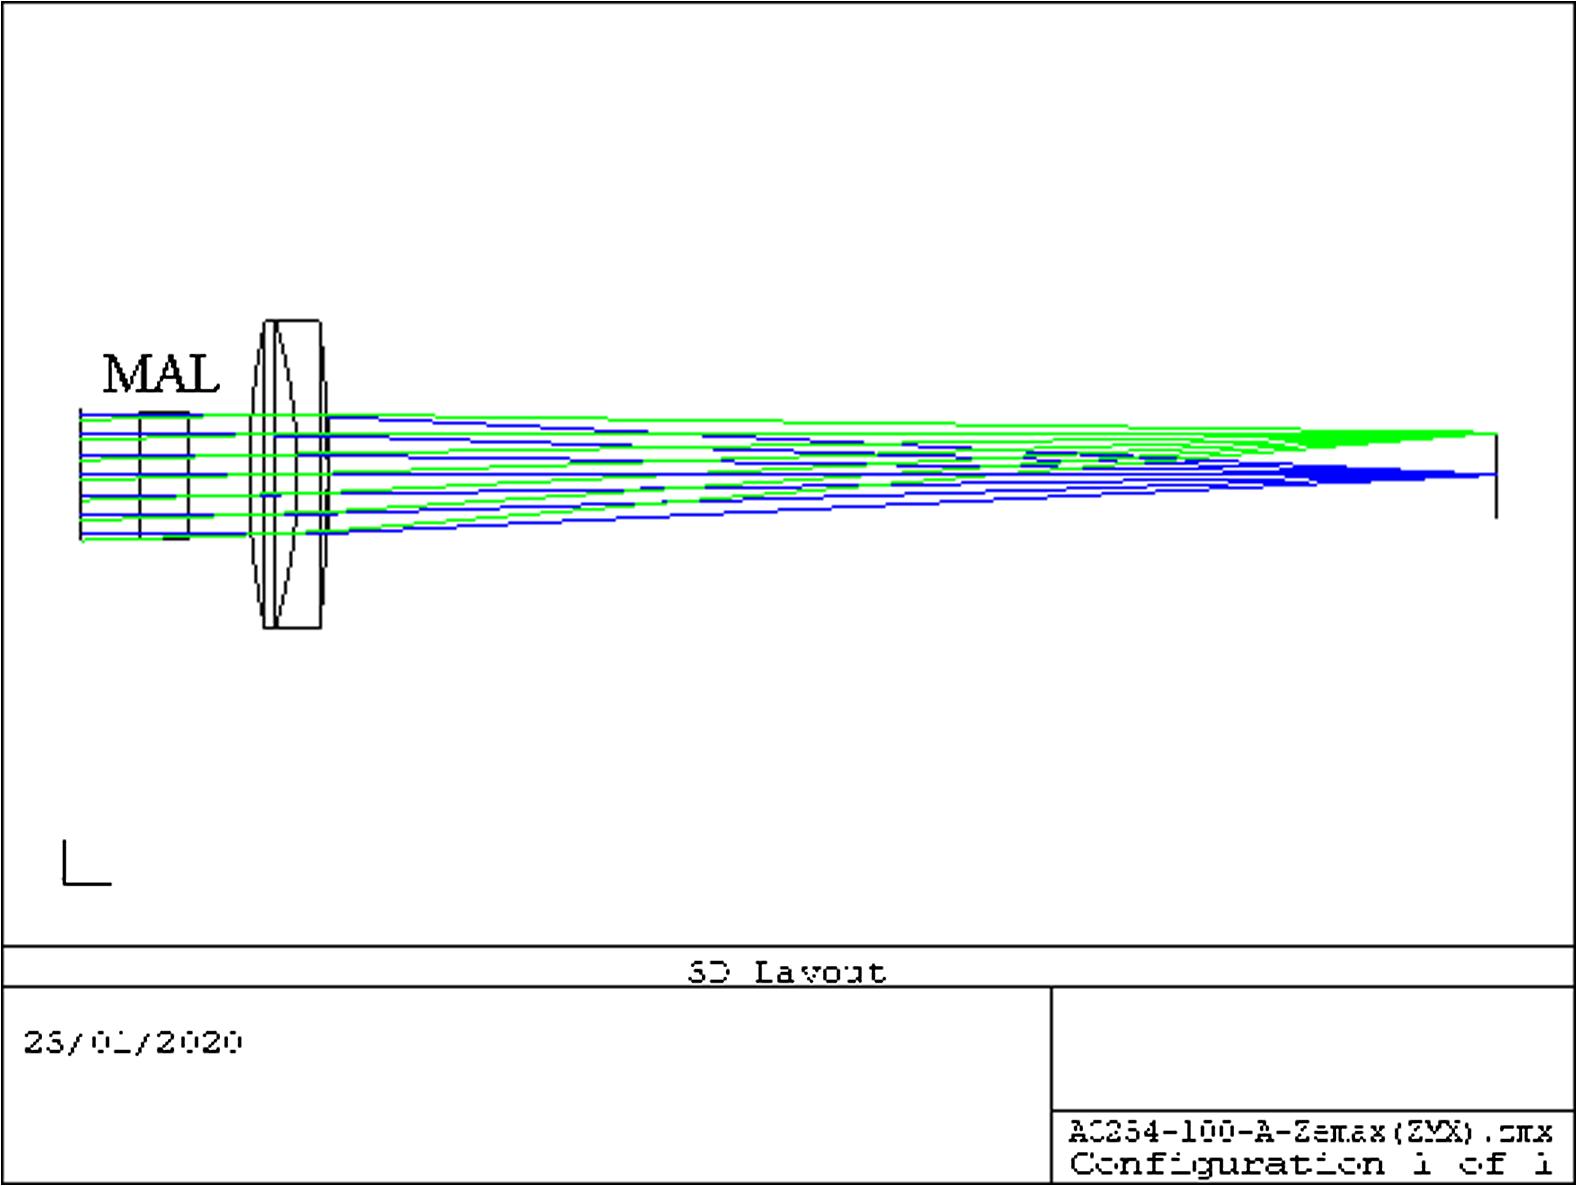 M42 optic driver download for windows 10 32-bit